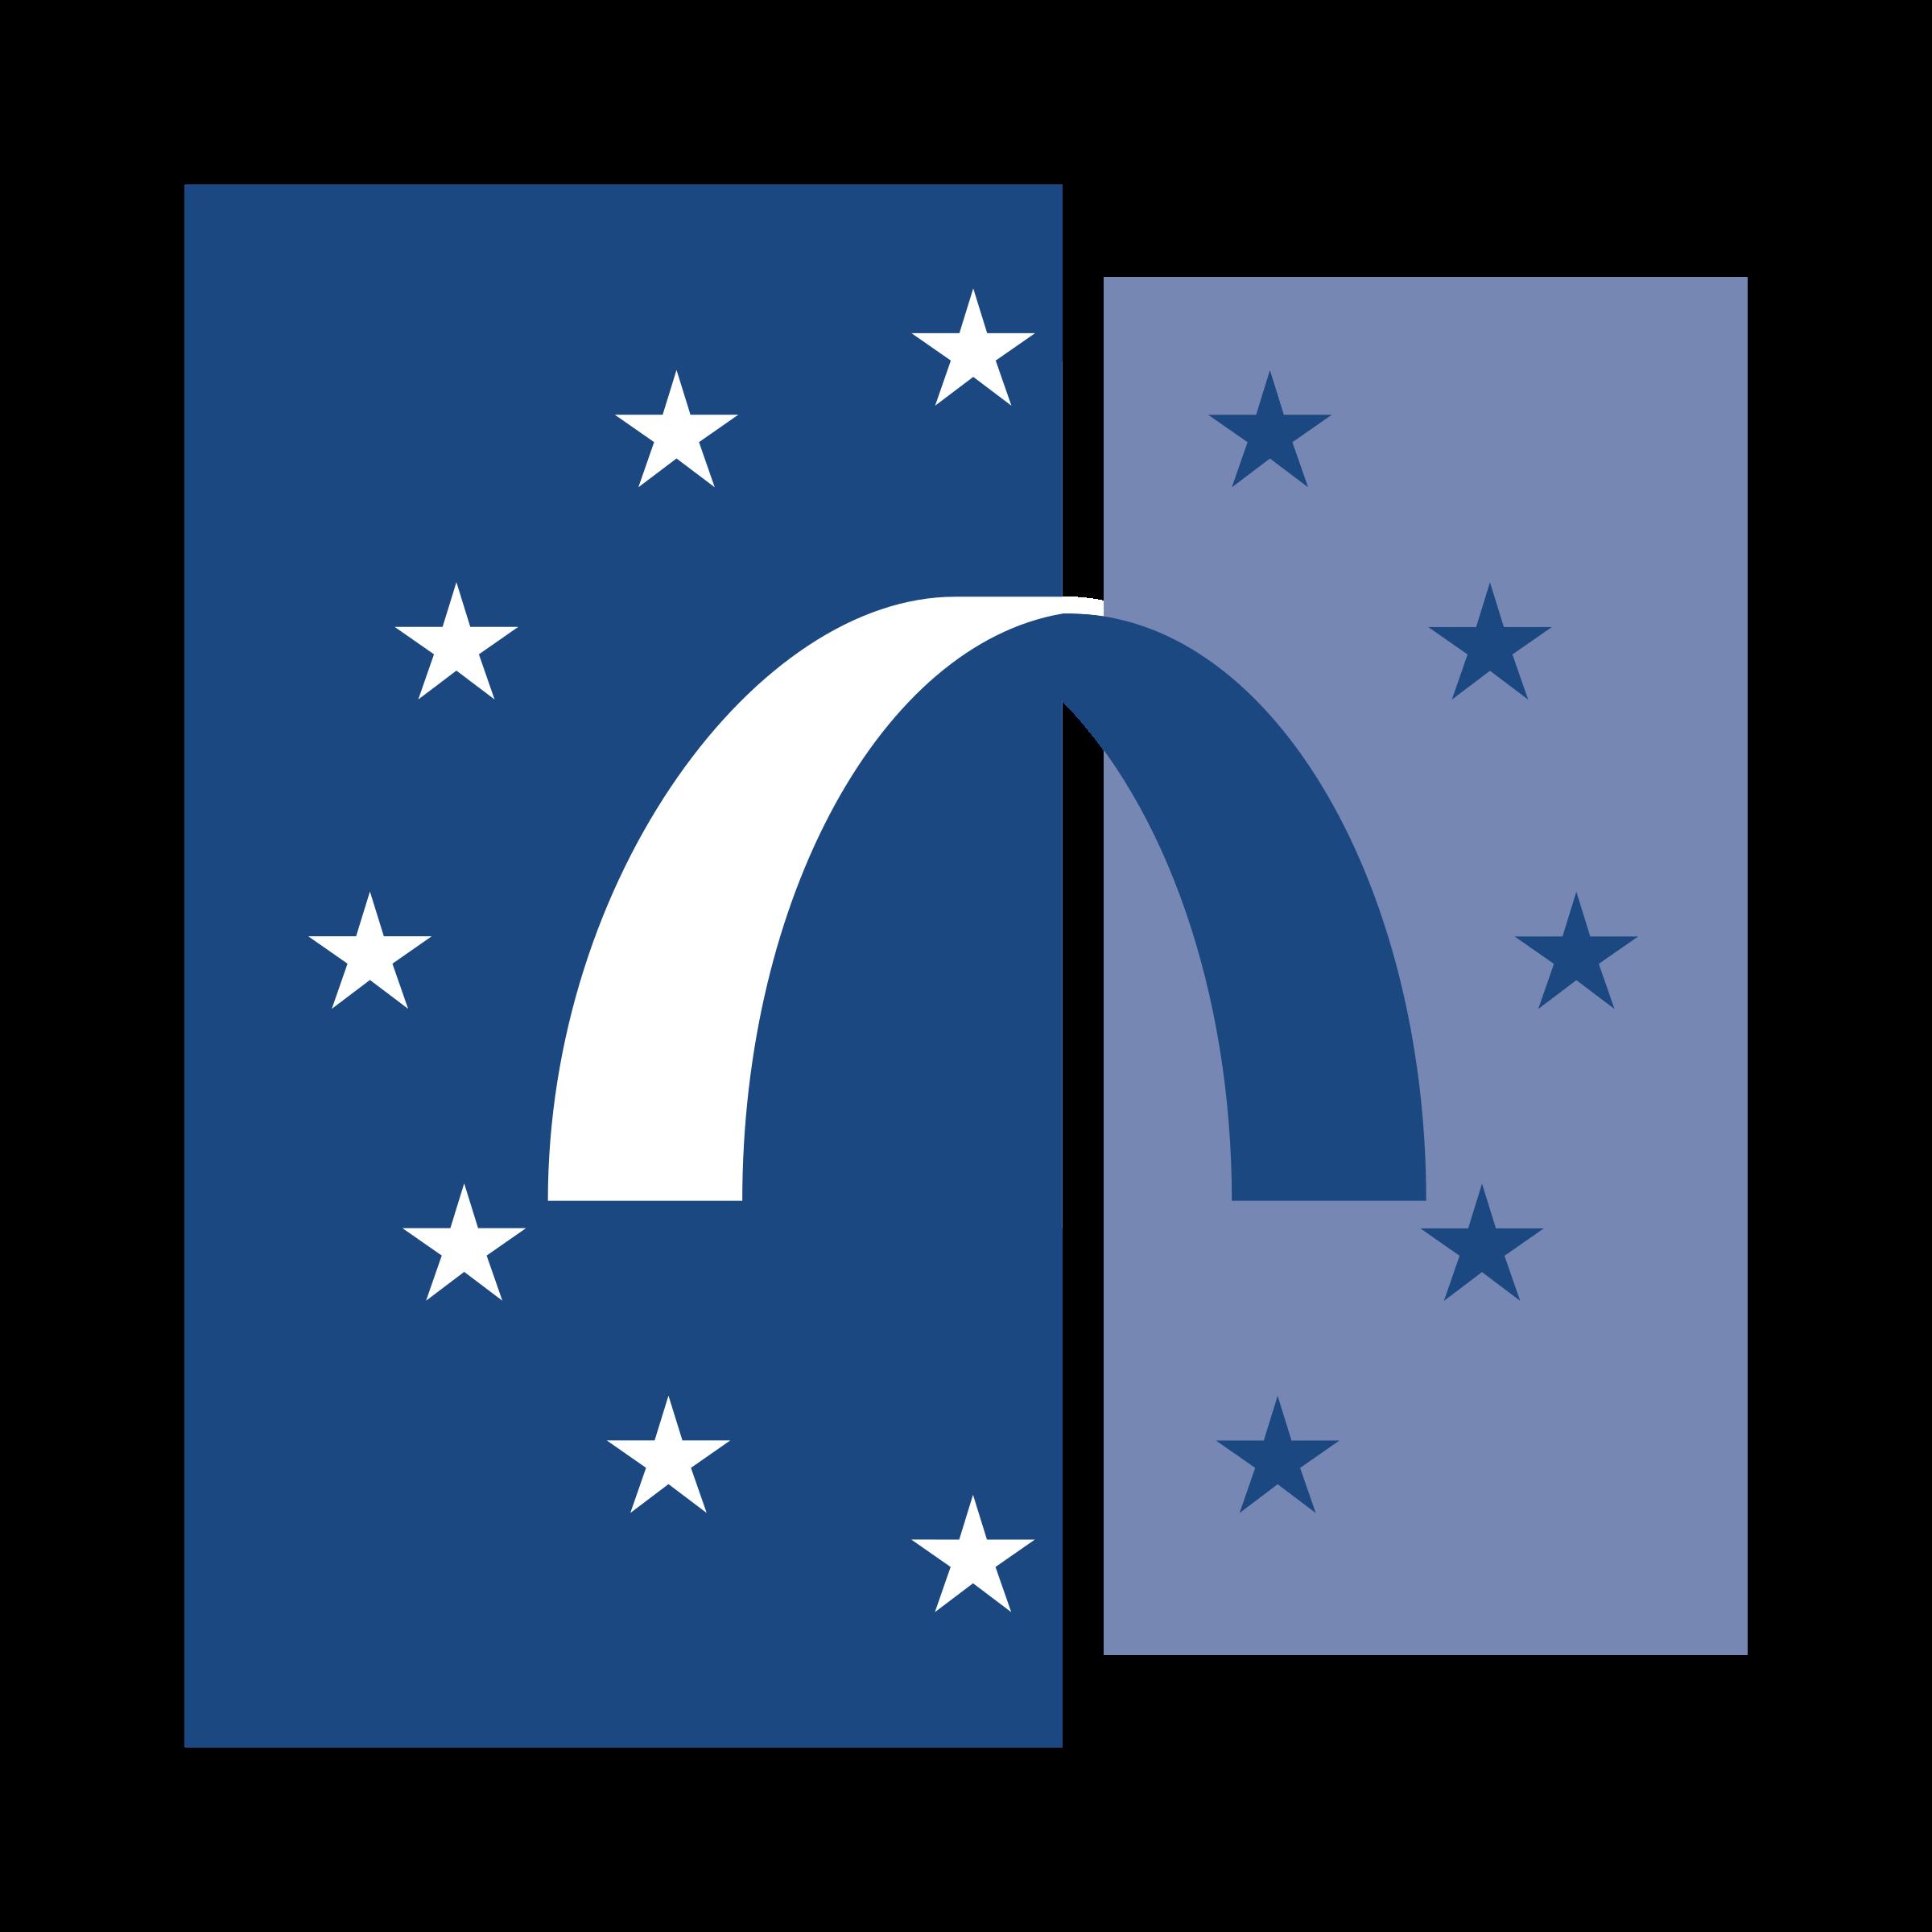 emcdda-logo-png-transparent.png